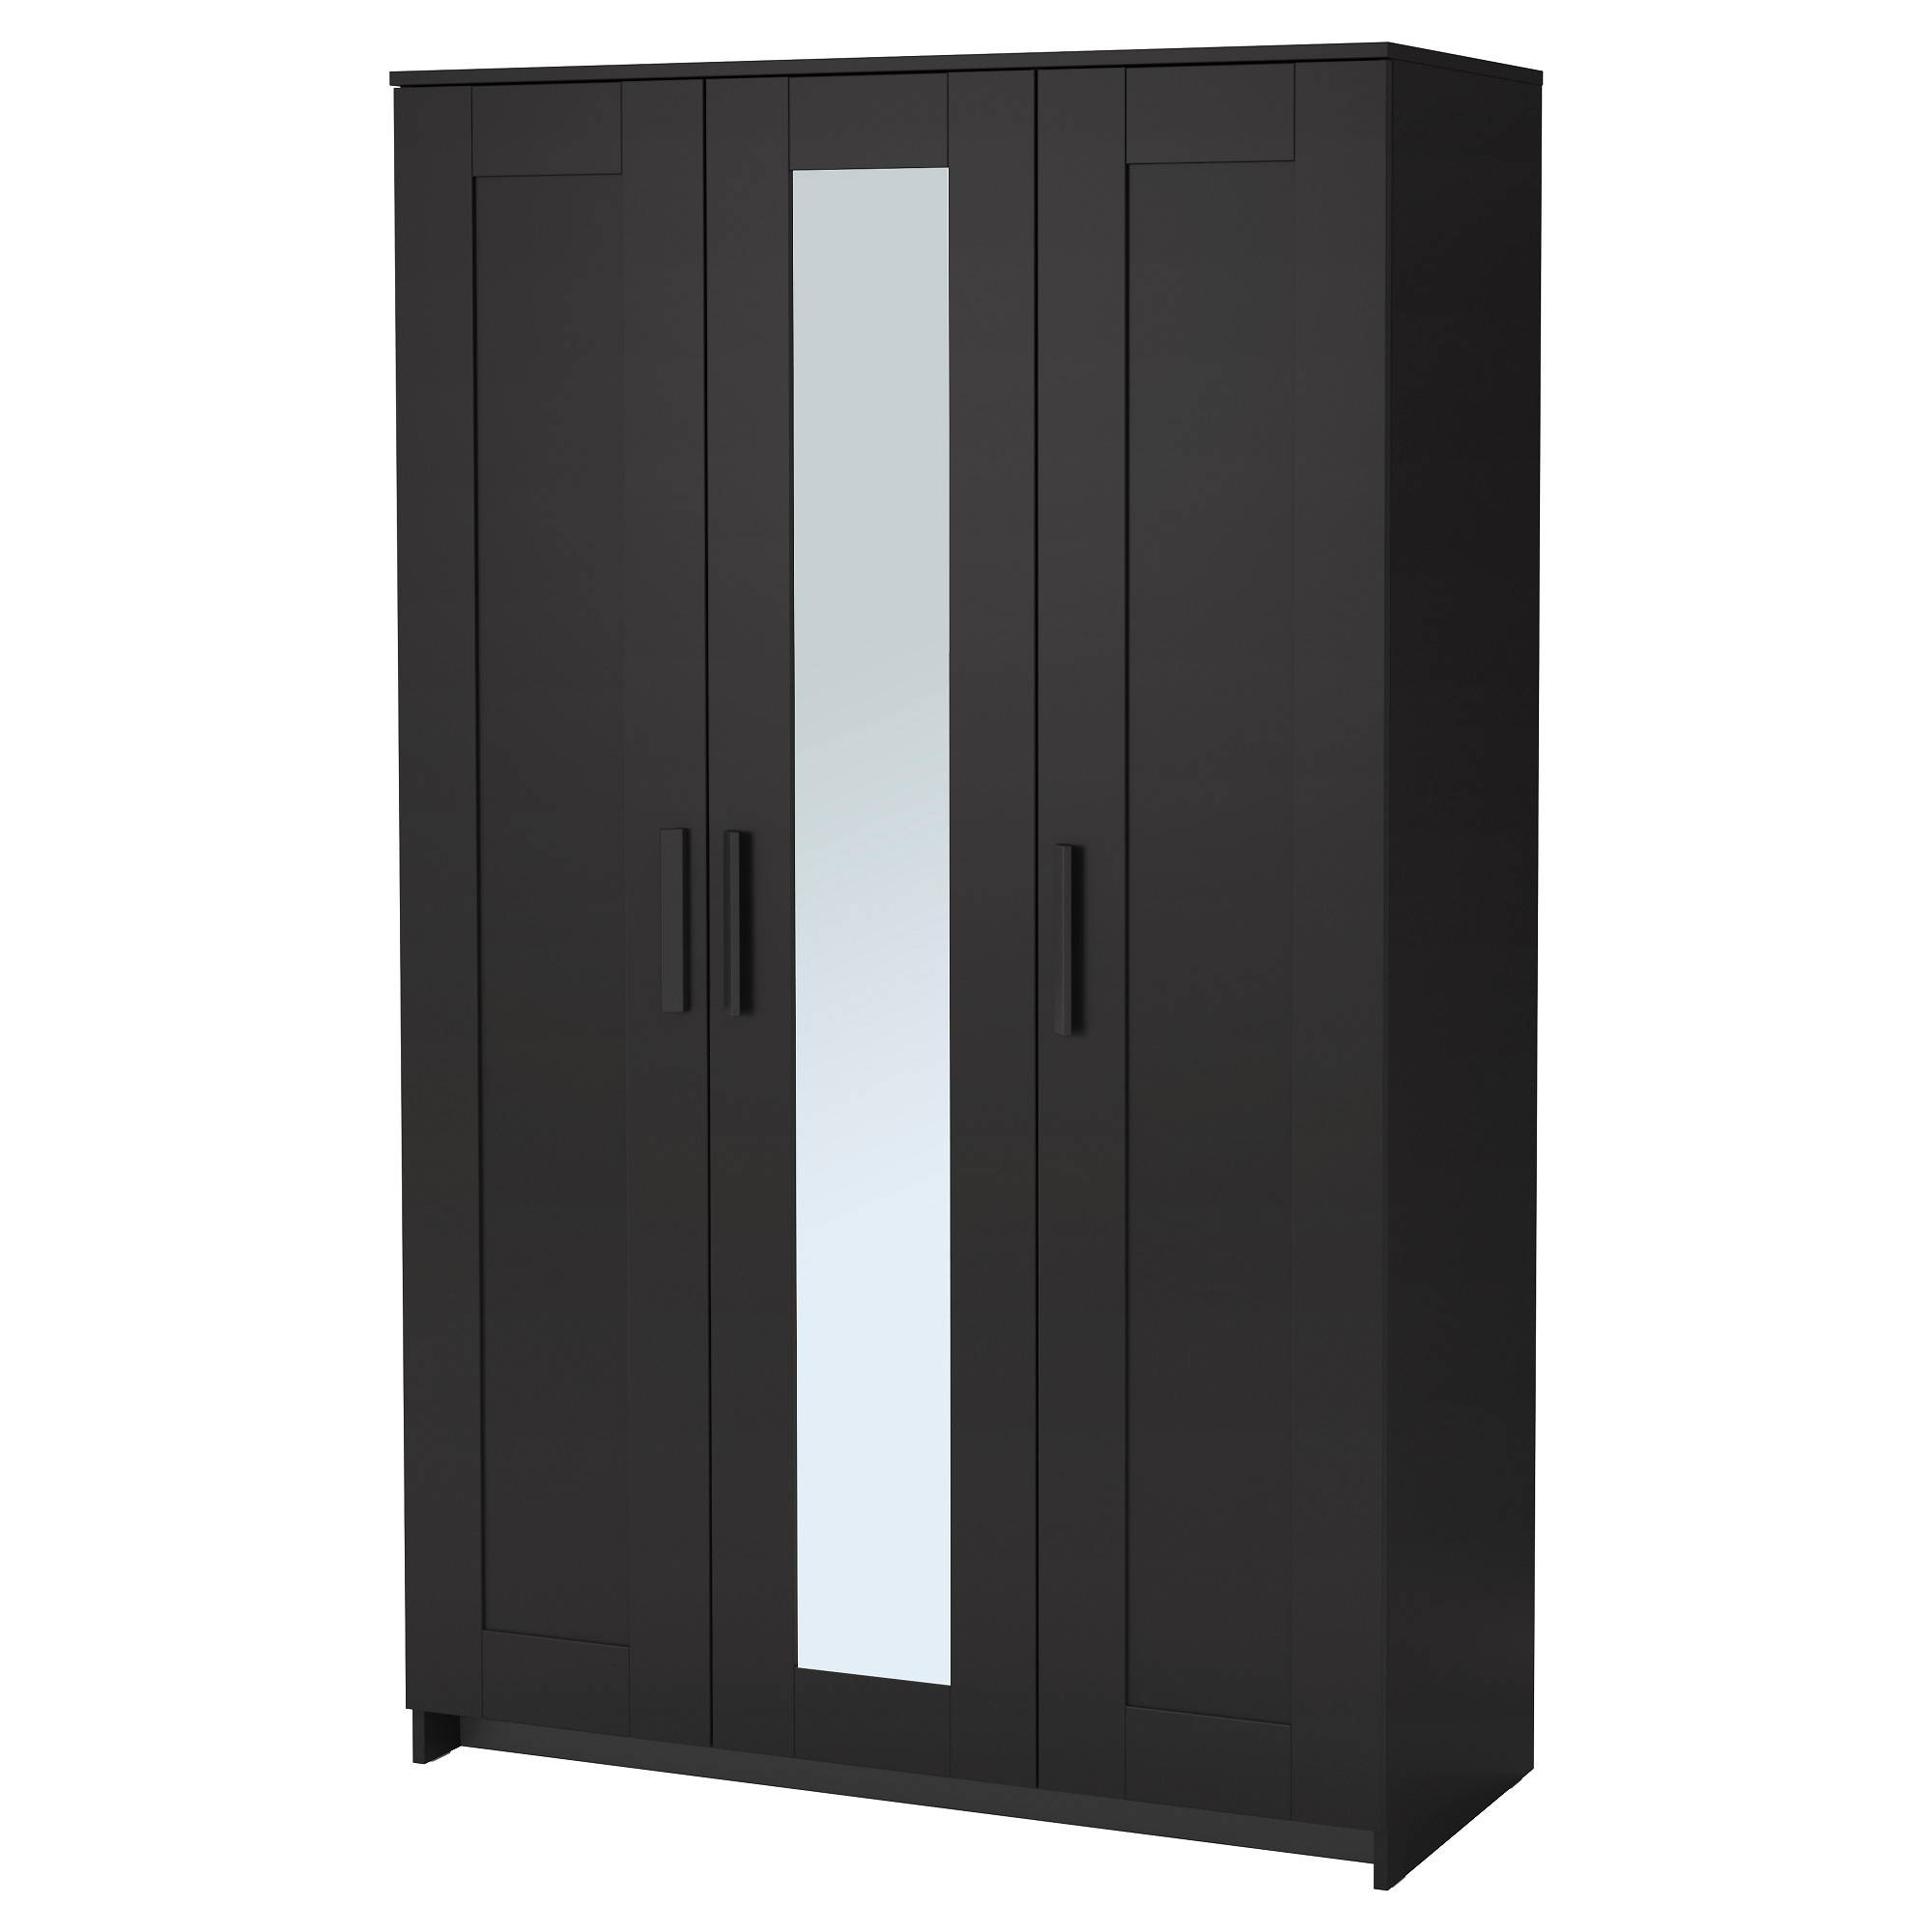 Wardrobes, Armoires & Closets – Ikea In Black Single Door Wardrobes (View 15 of 15)